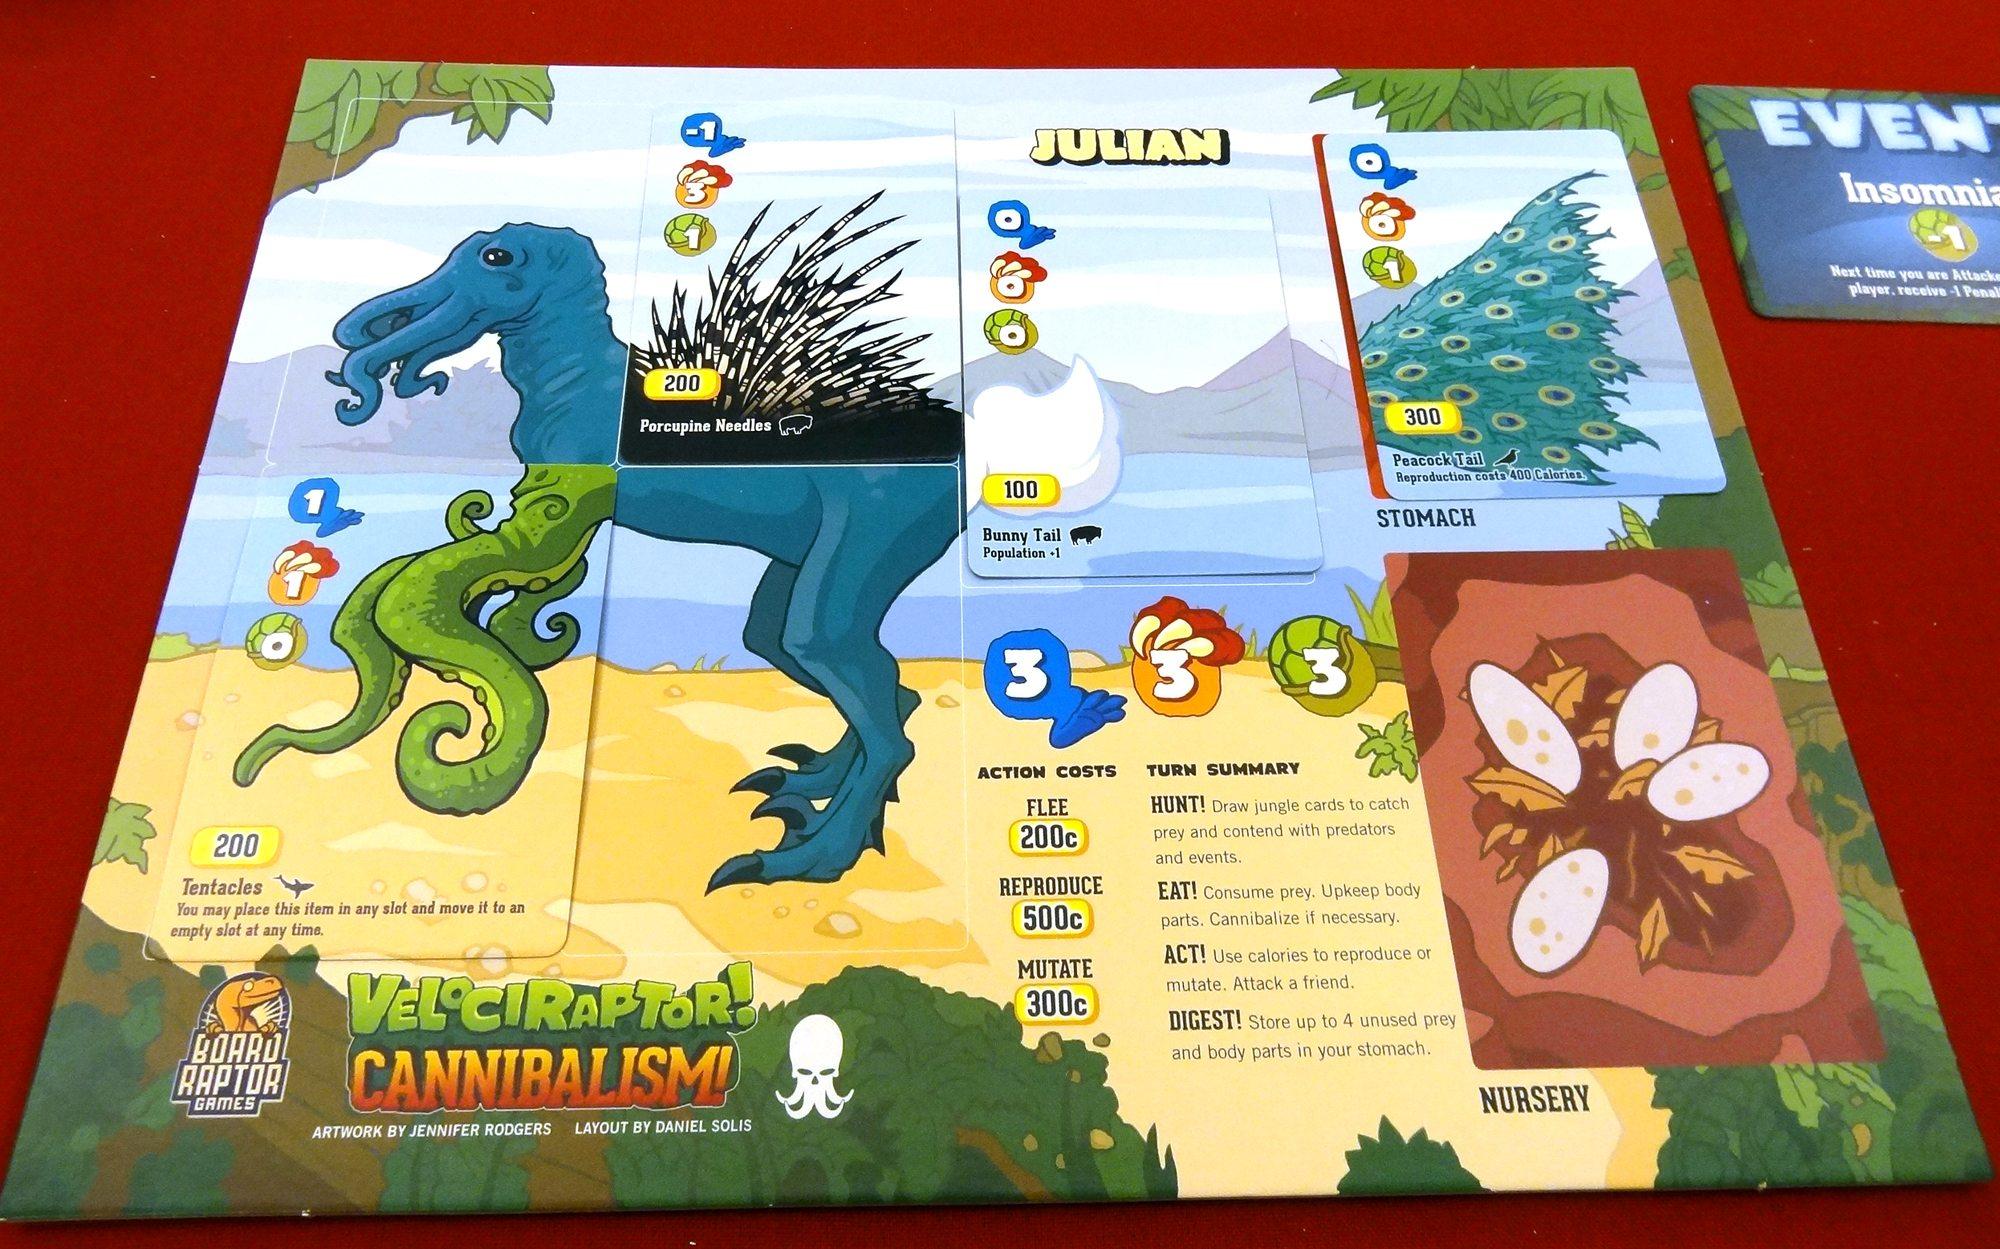 Velociraptor! Cannibalism! Julian